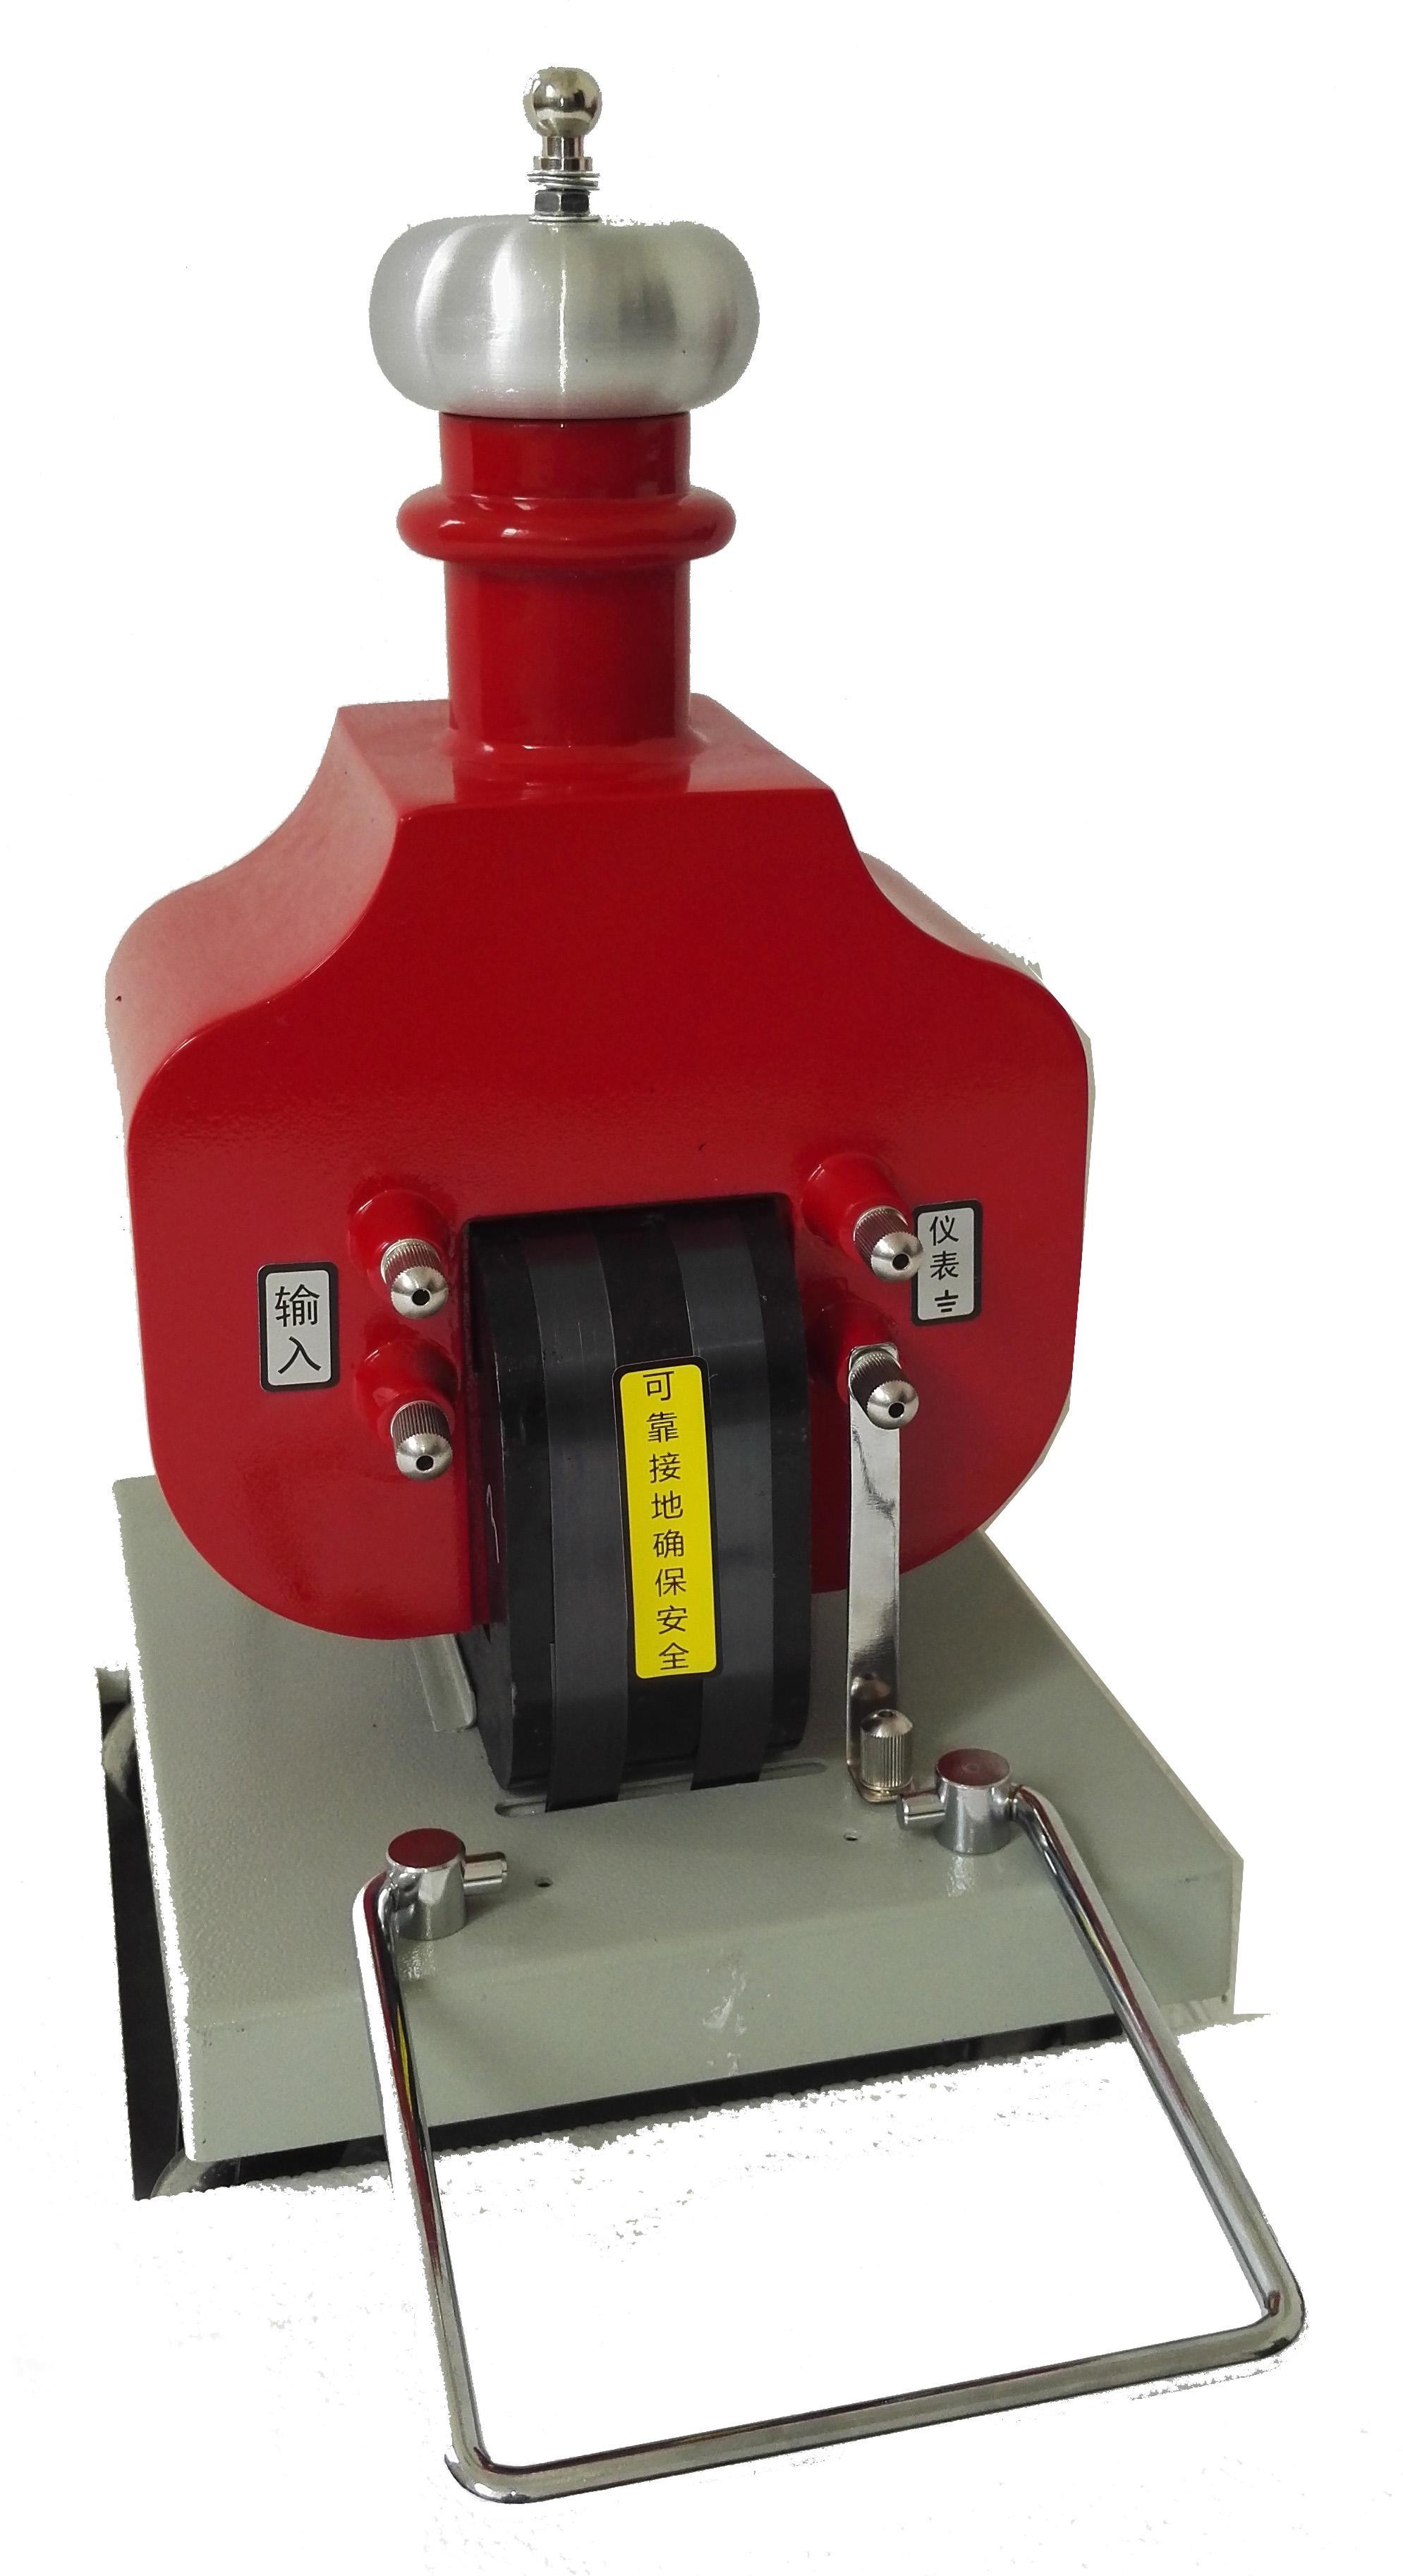 GTB-5/50干式高压试验变压器  轻型高压试验变 50kv工频耐压试验装置 干式高压试验变压器,轻型高压试验变,工频耐压试验装置